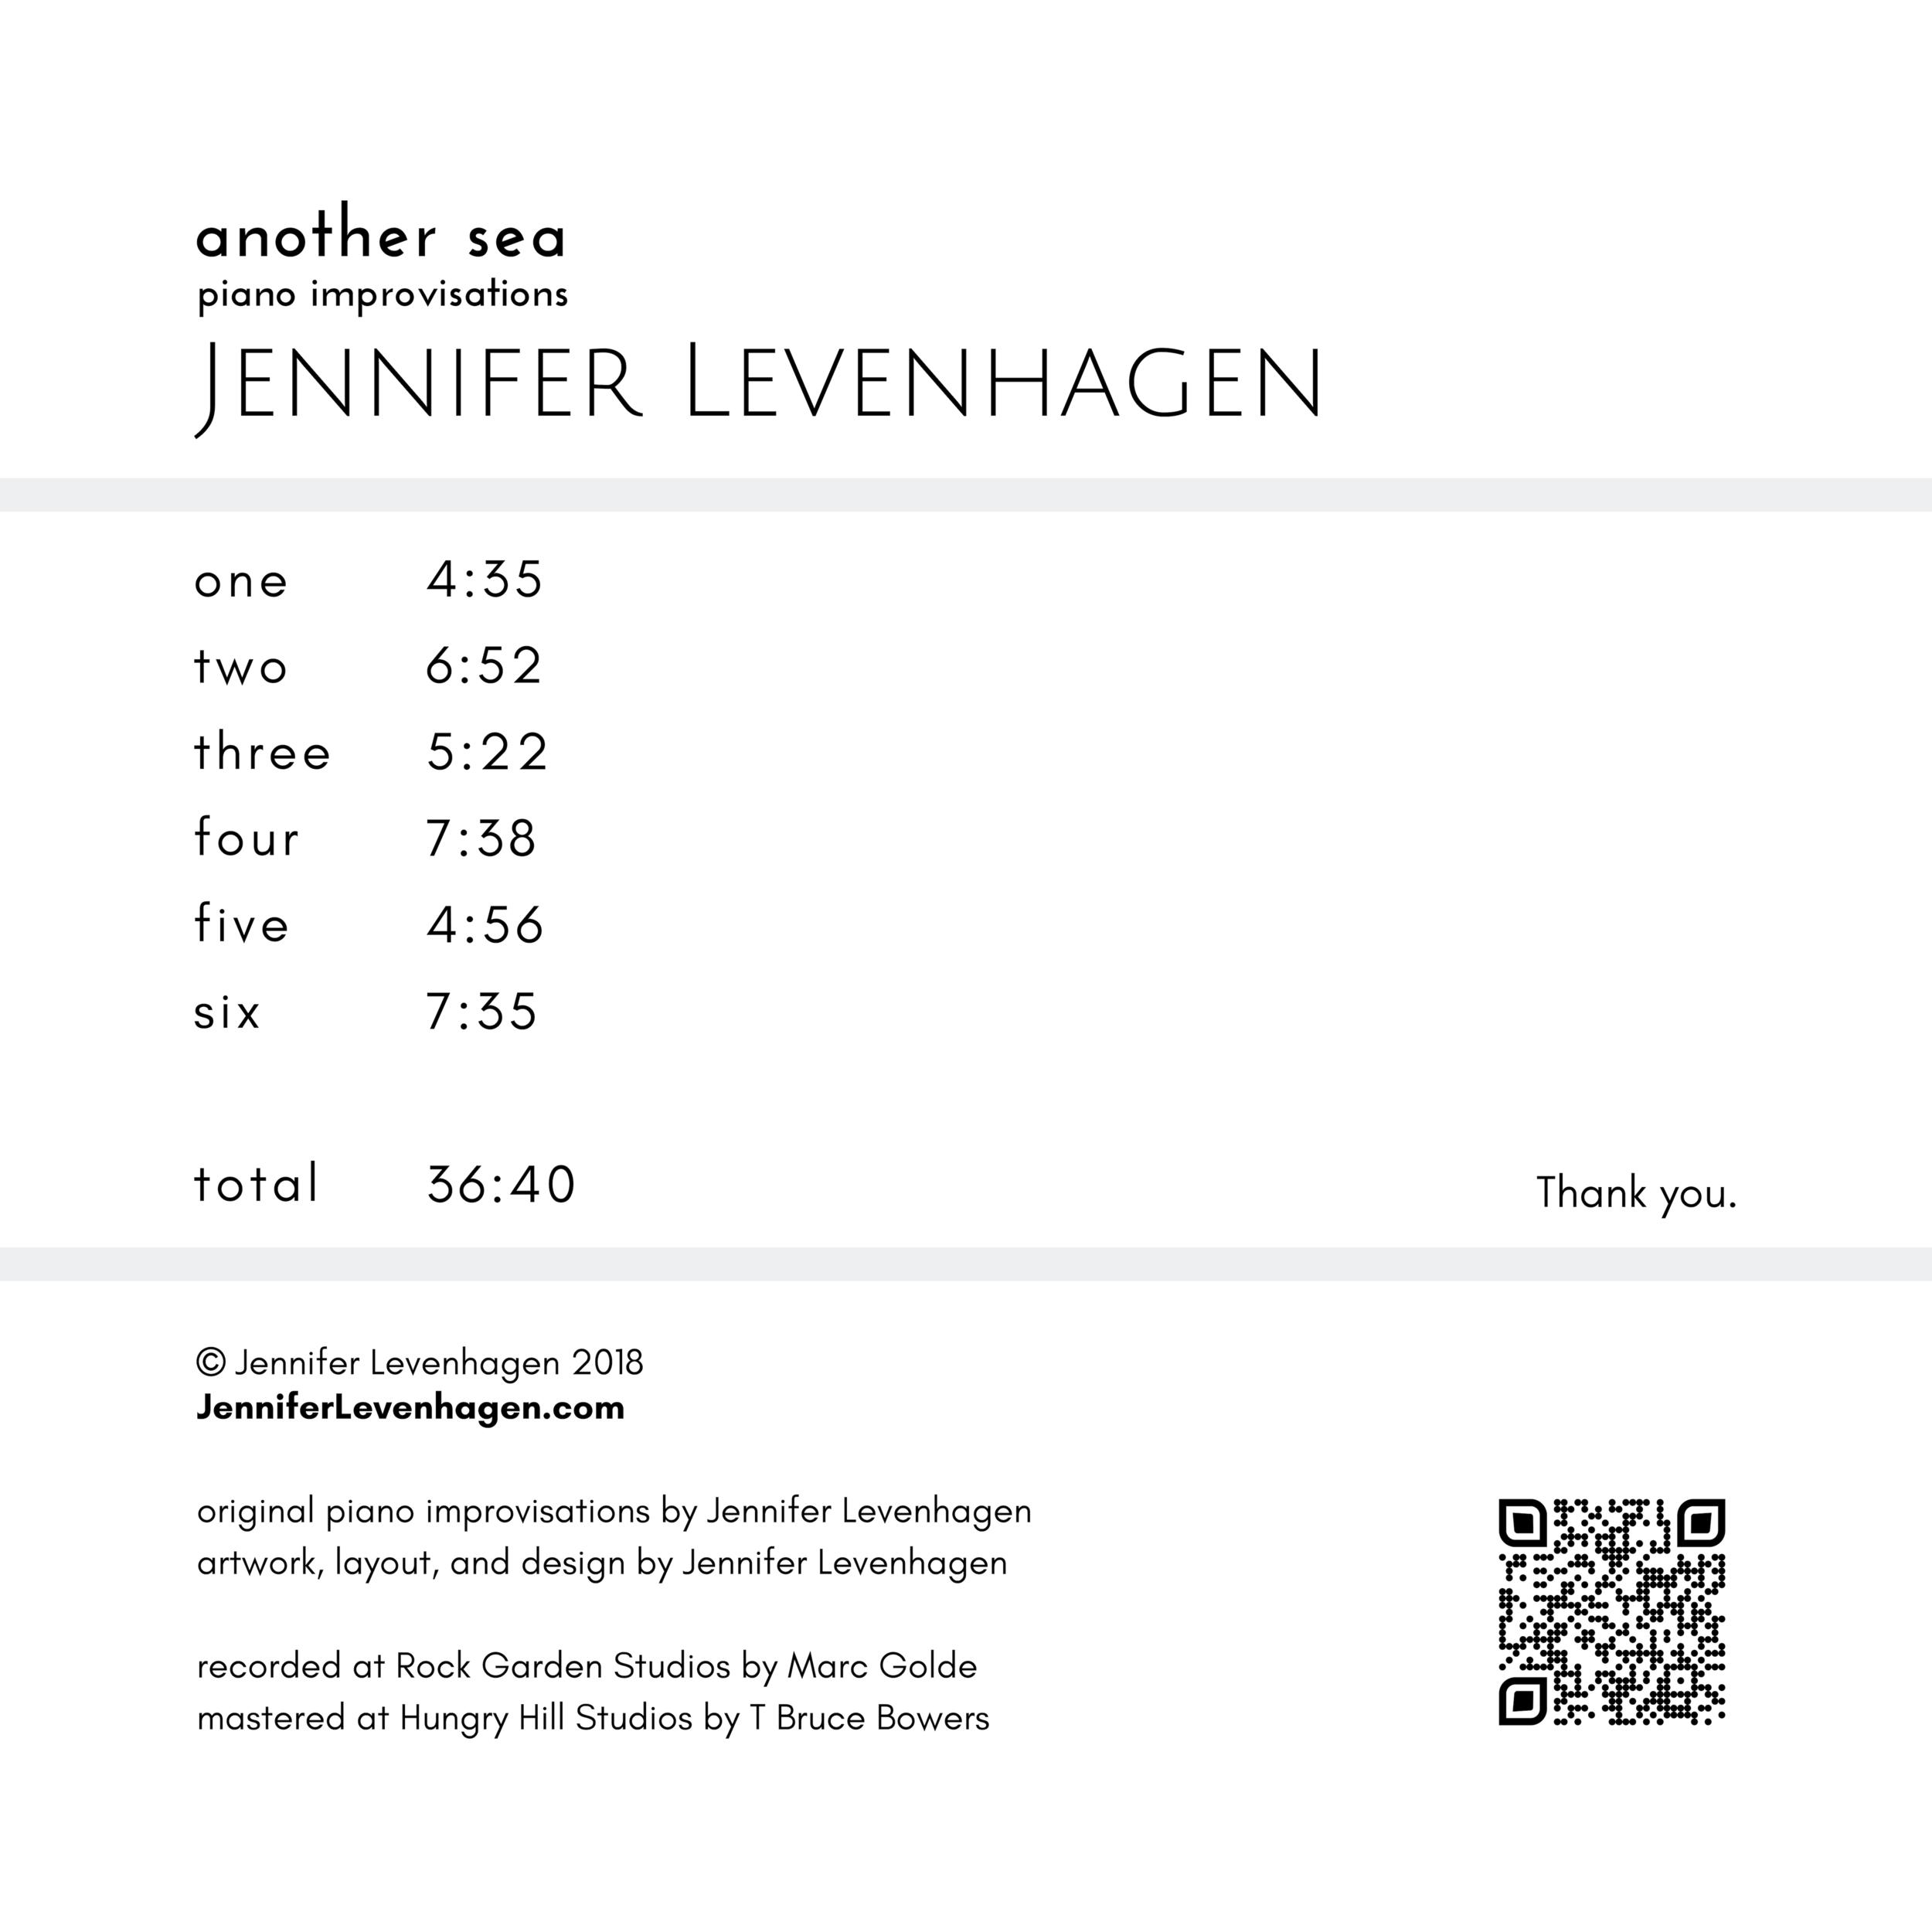 with updated tracks QR 5000x5000 JenniferLevenhagen.com original piano improvisations by Jennifer Levenhagen artwork, layout, and design by Jennifer Levenhagen recorded at Rock Garden Studios by Marc Golde mastered a.png